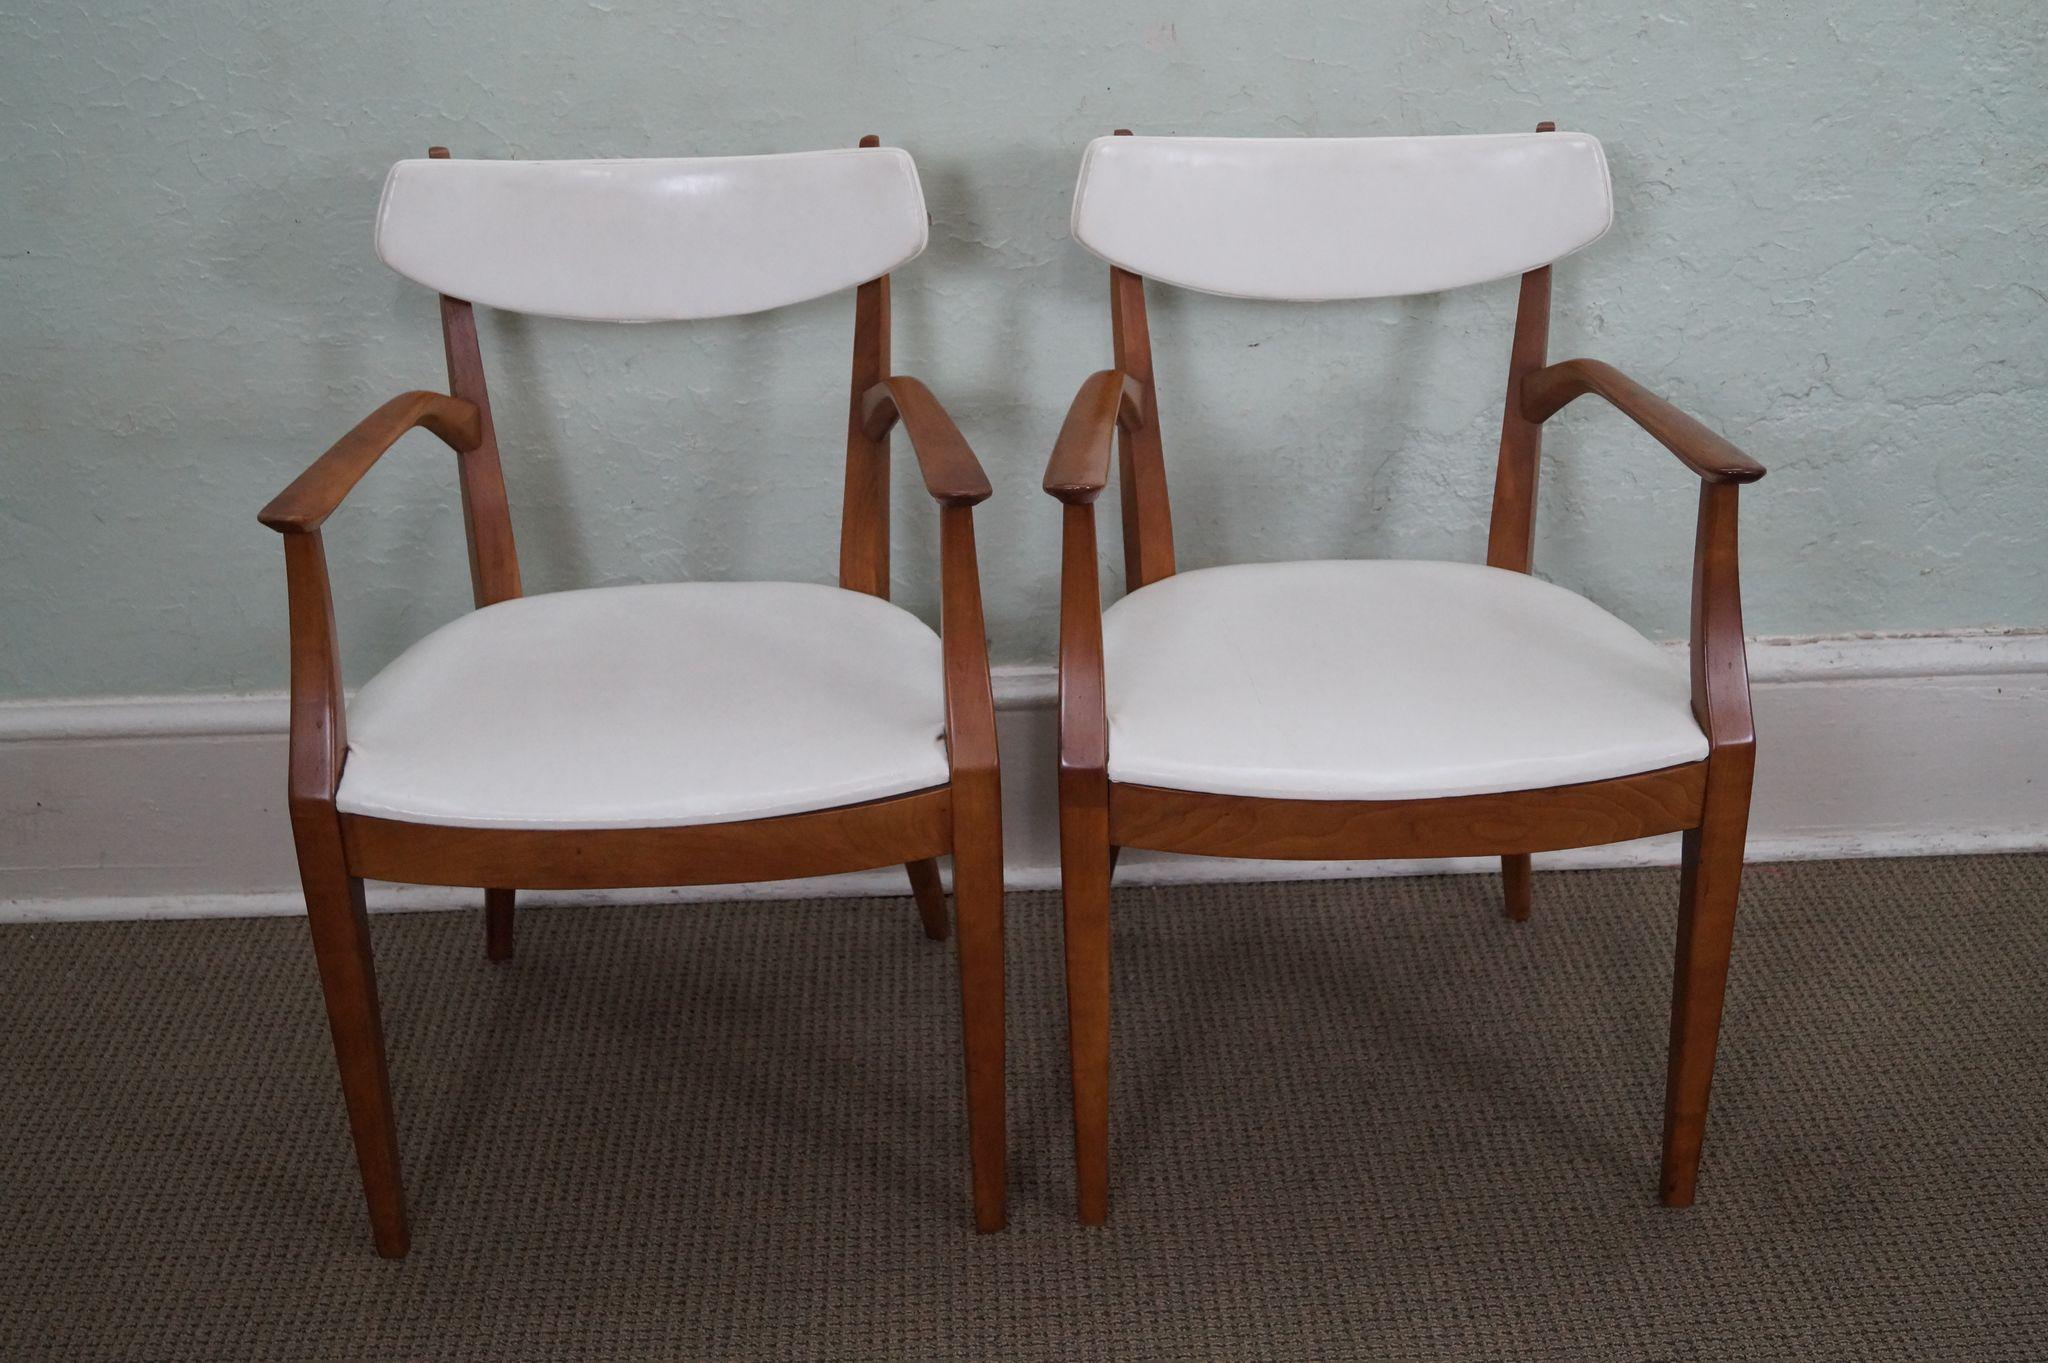 Drexel Suncoast Kipp Stewart Pair of Solid Wood White